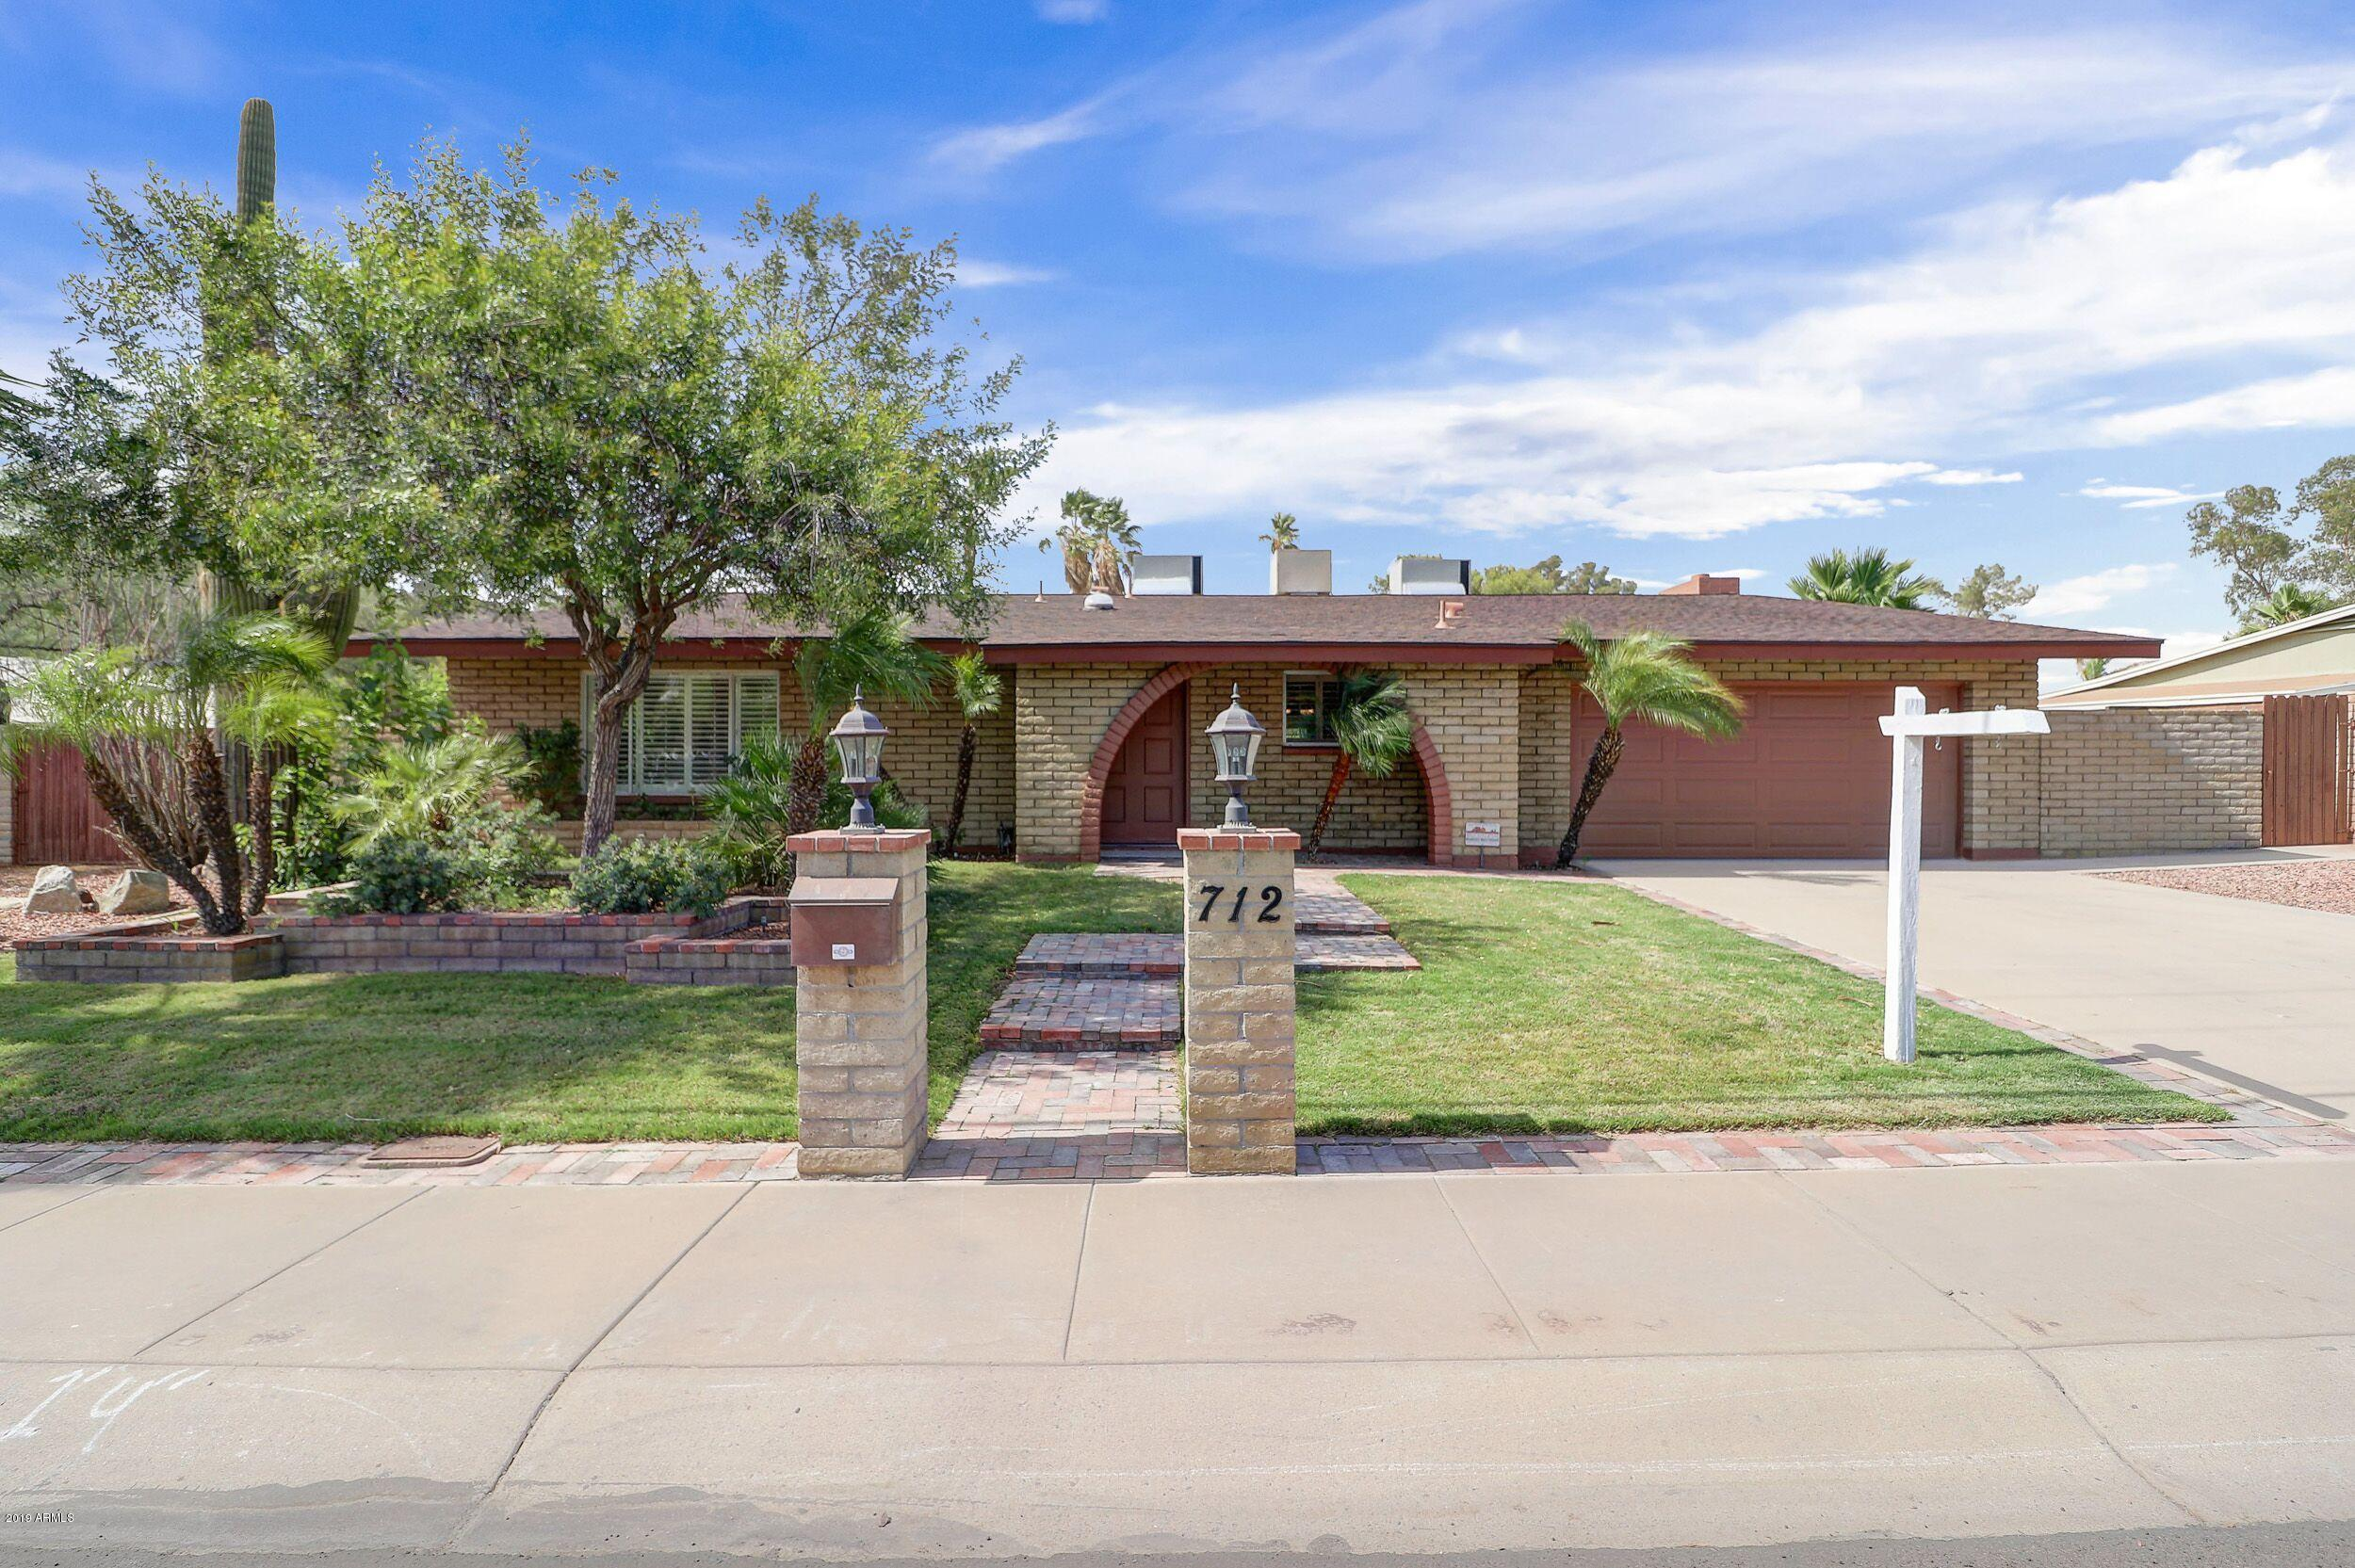 Photo for 712 W Thunderbird Road, Phoenix, AZ 85023 (MLS # 5951490)